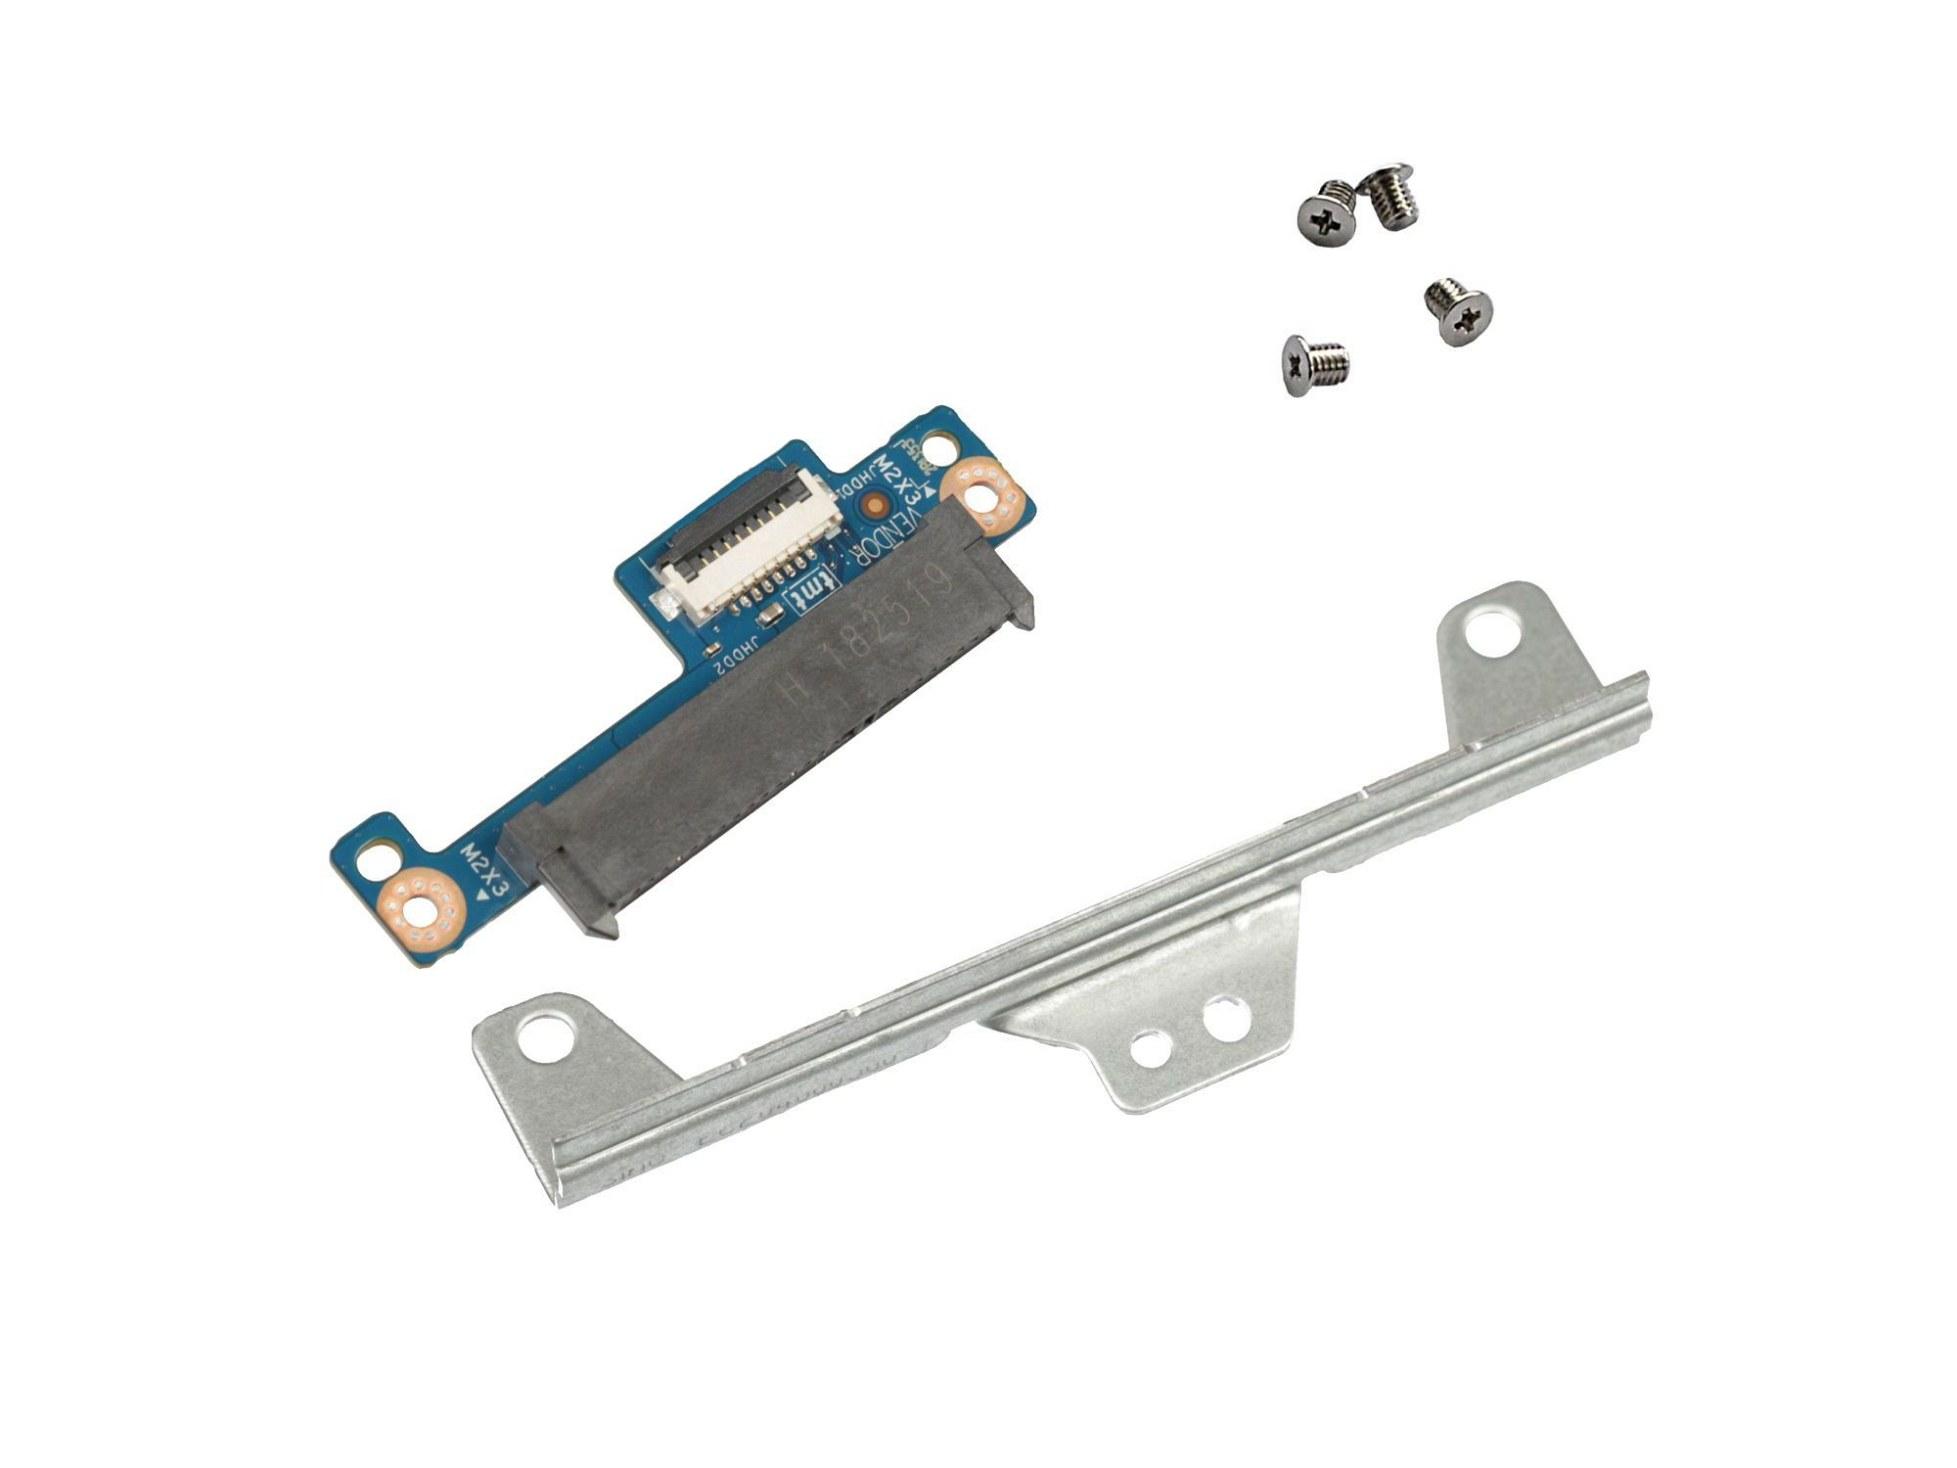 HP 924980-001 HP Festplattenrahmen/Adapter inkl. HDD Schrauben